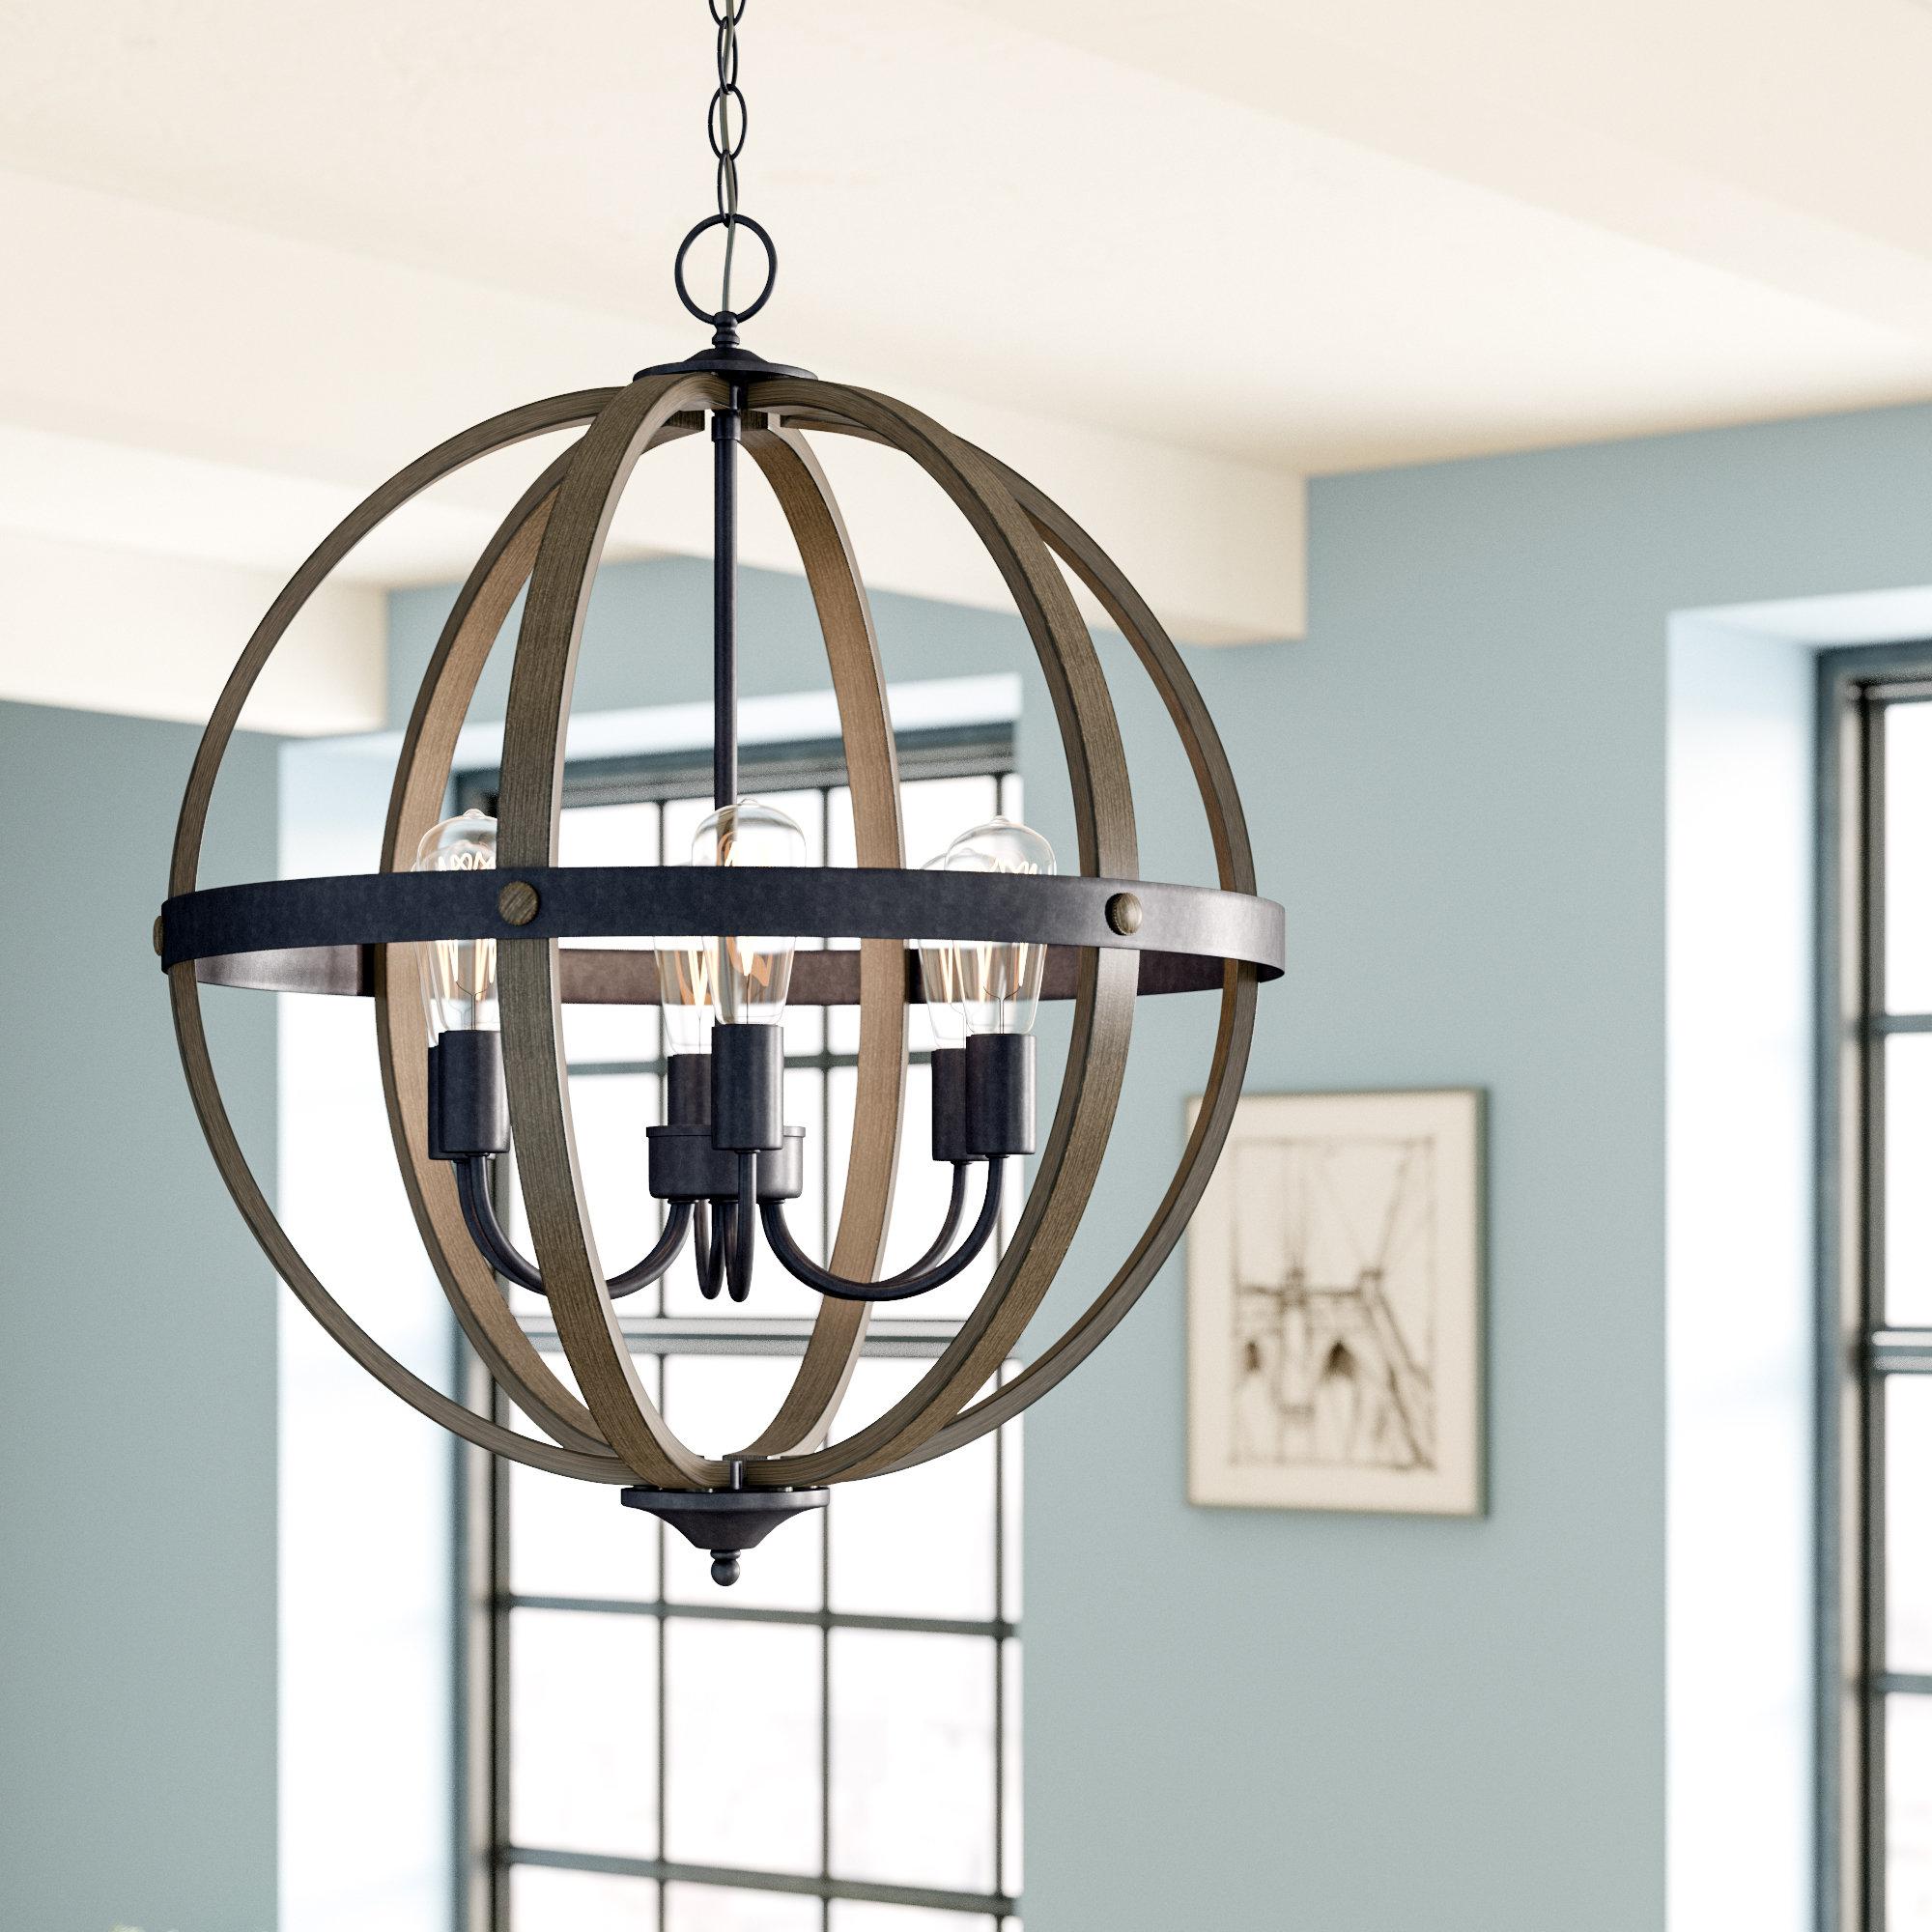 Best And Newest Kathrina 6 Light Globe Chandelier Within Joon 6 Light Globe Chandeliers (Gallery 4 of 20)